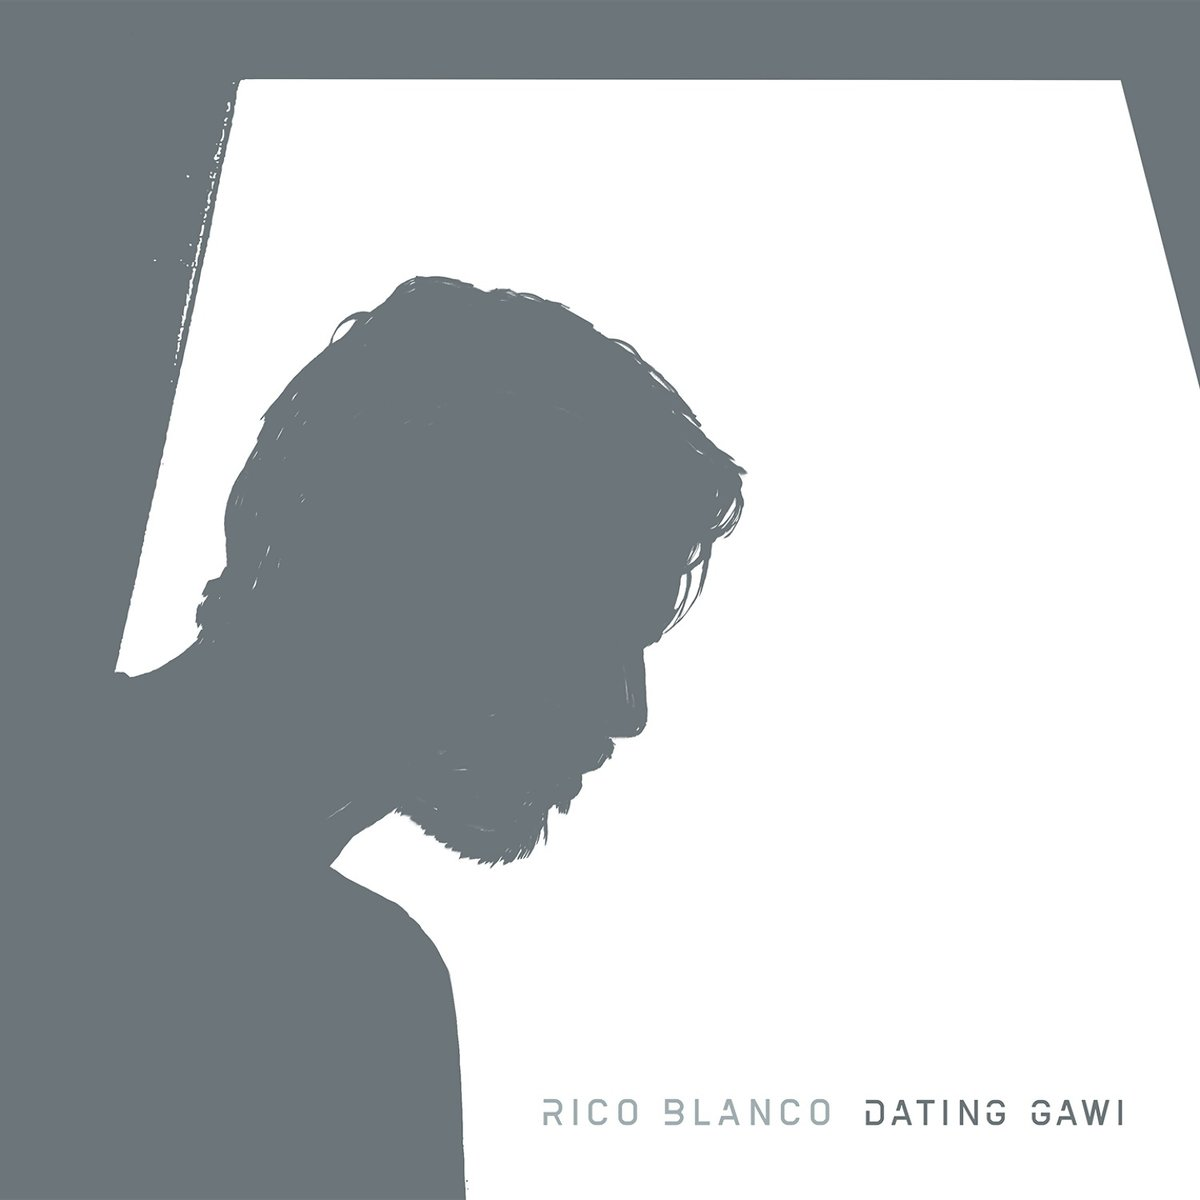 Rico blanco dating gawi